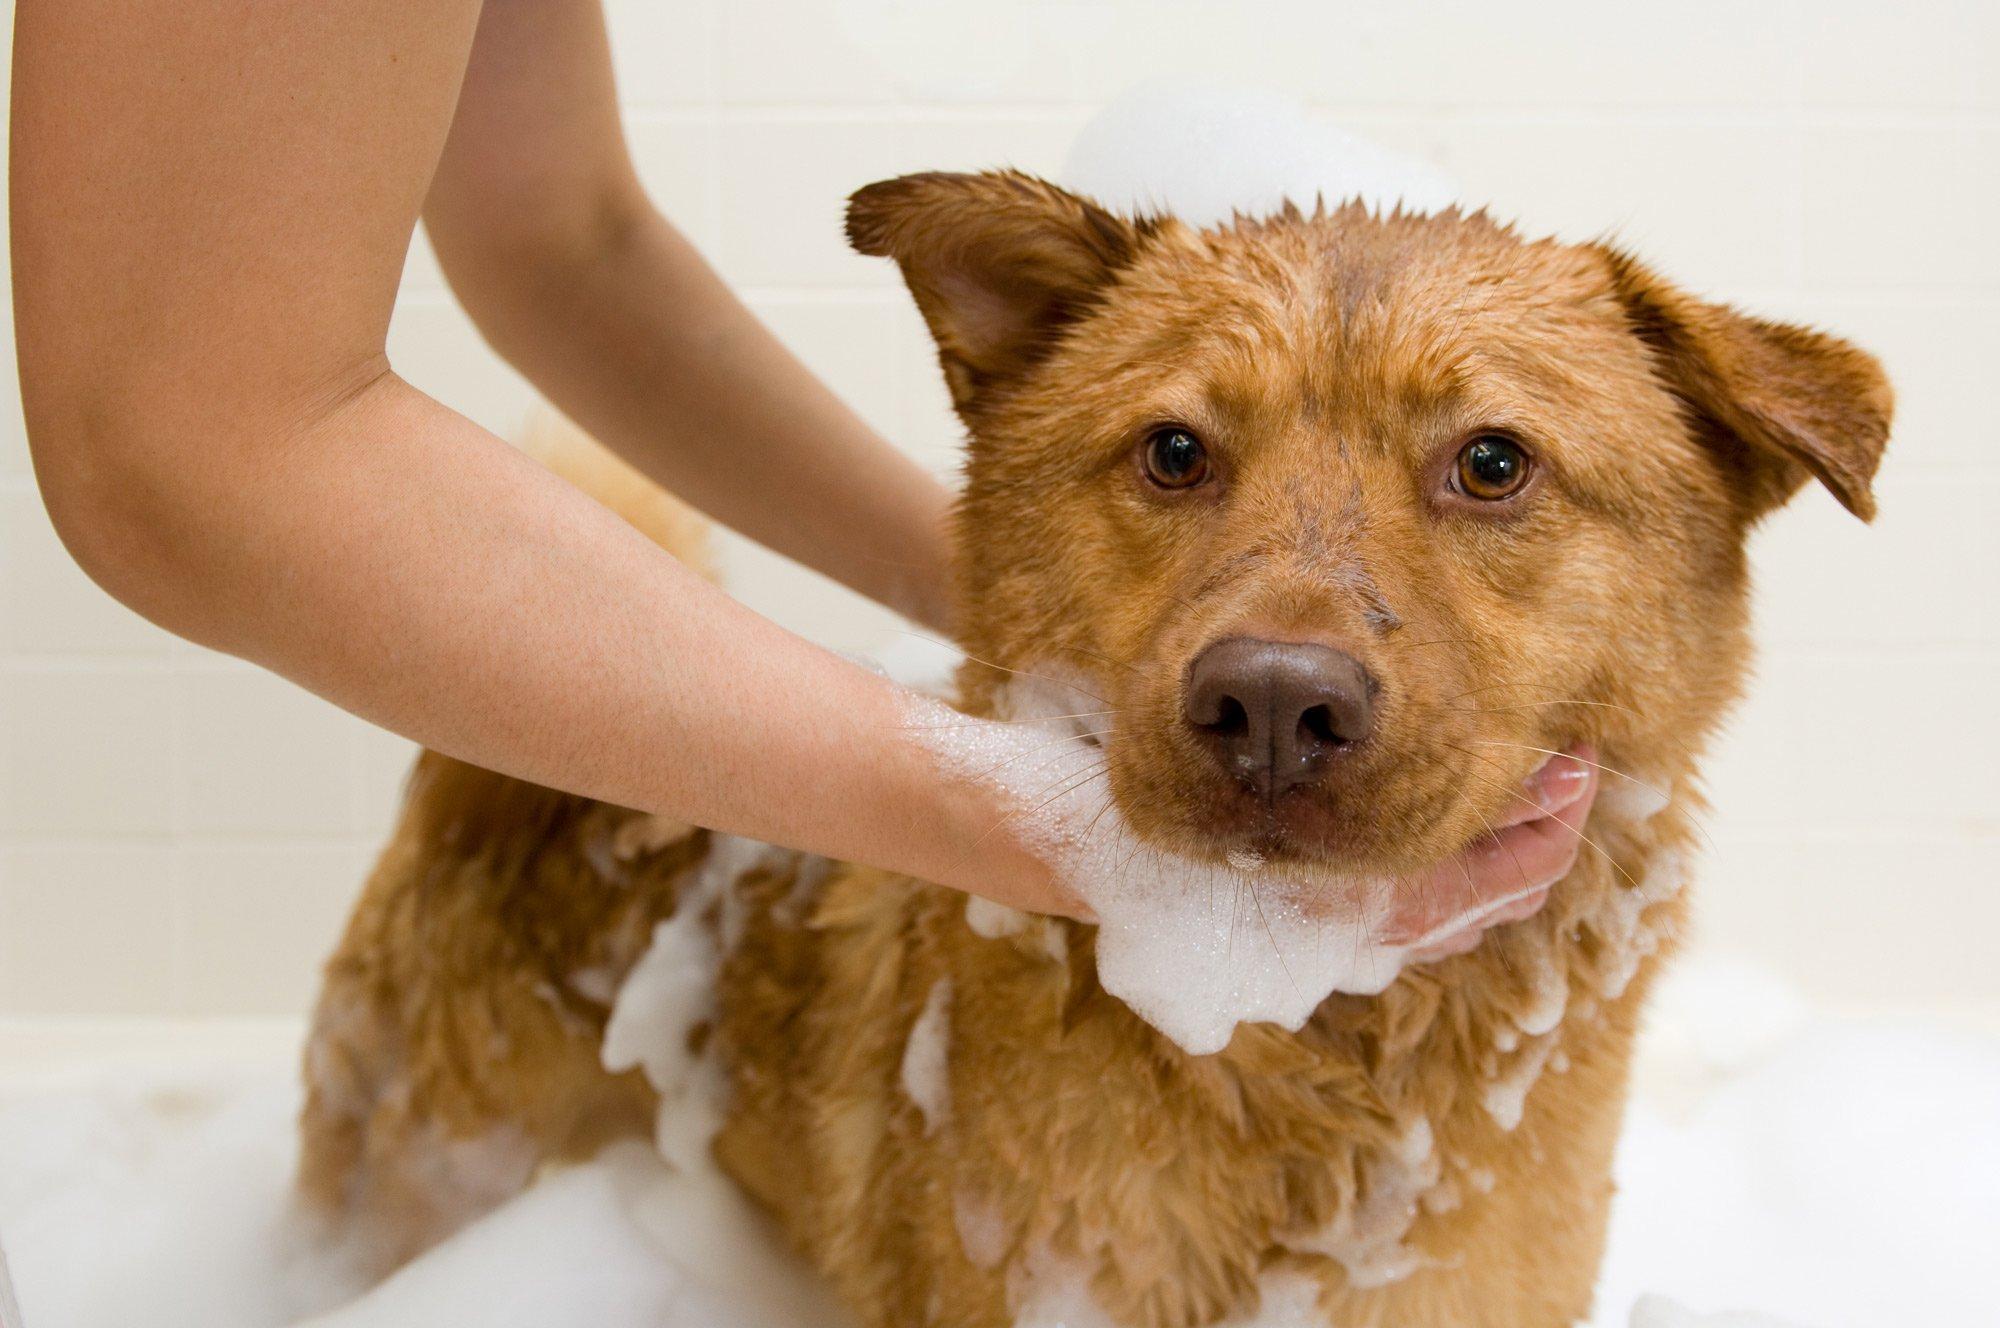 Bagno antiparassitario al cane a Cavaglià